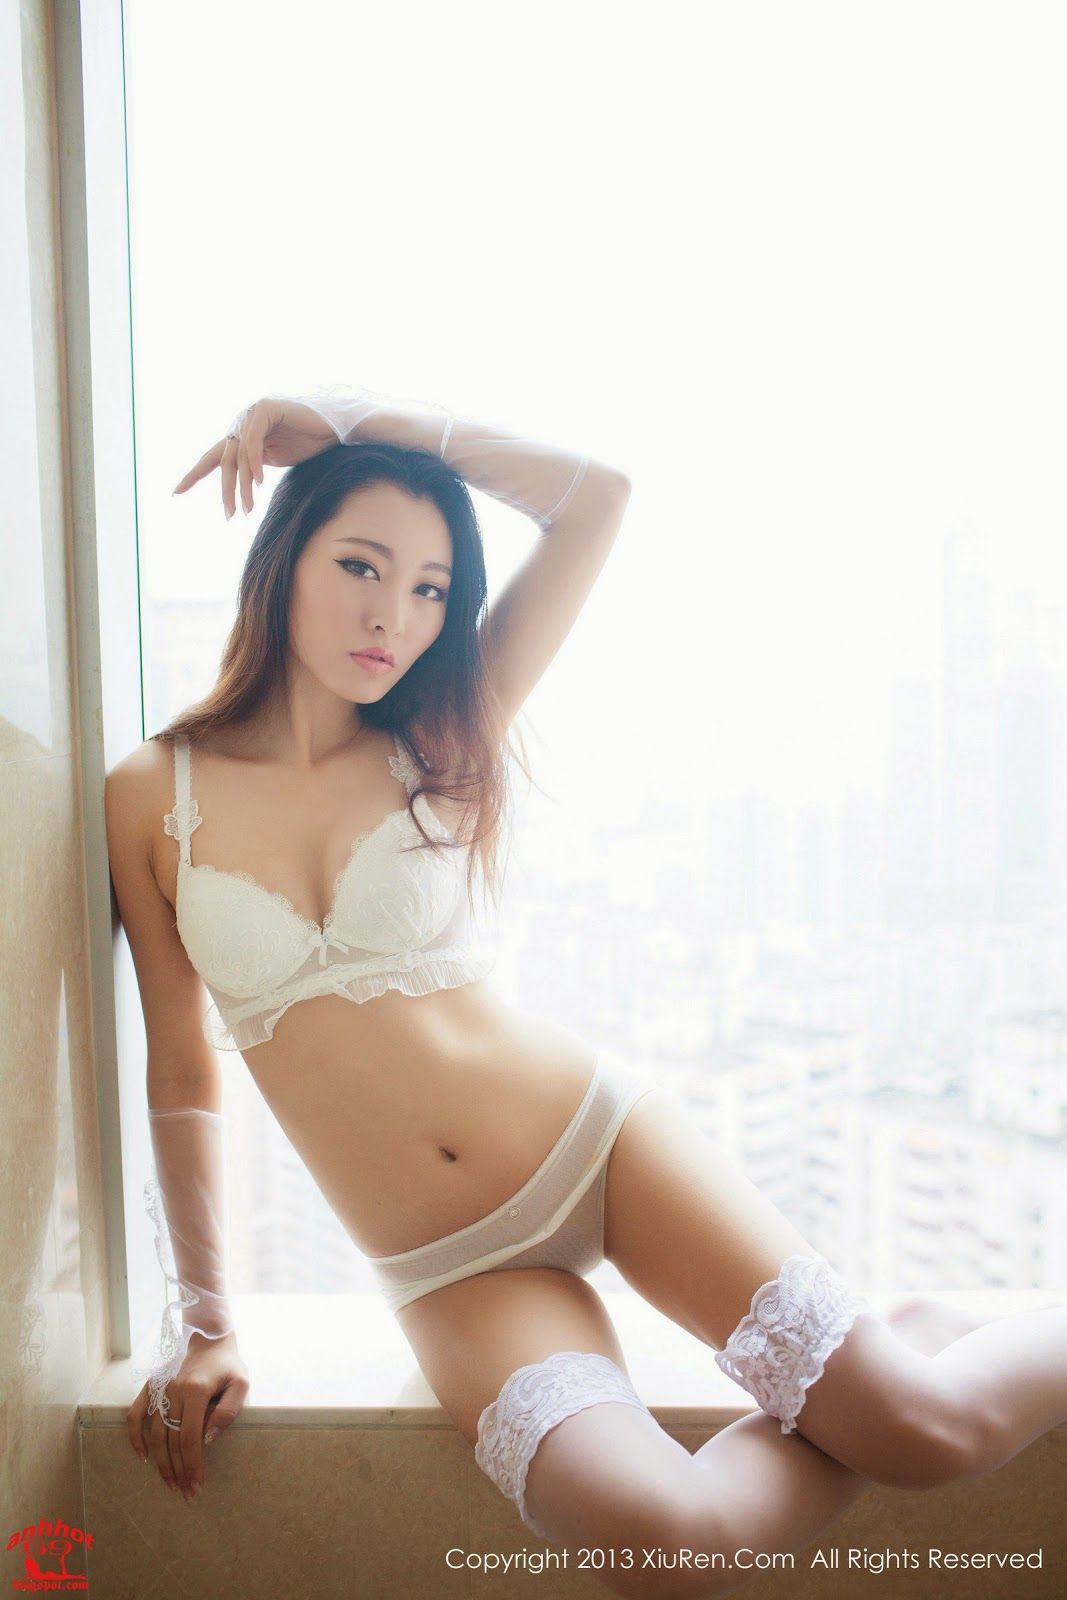 xiuren-xiuren-02491356